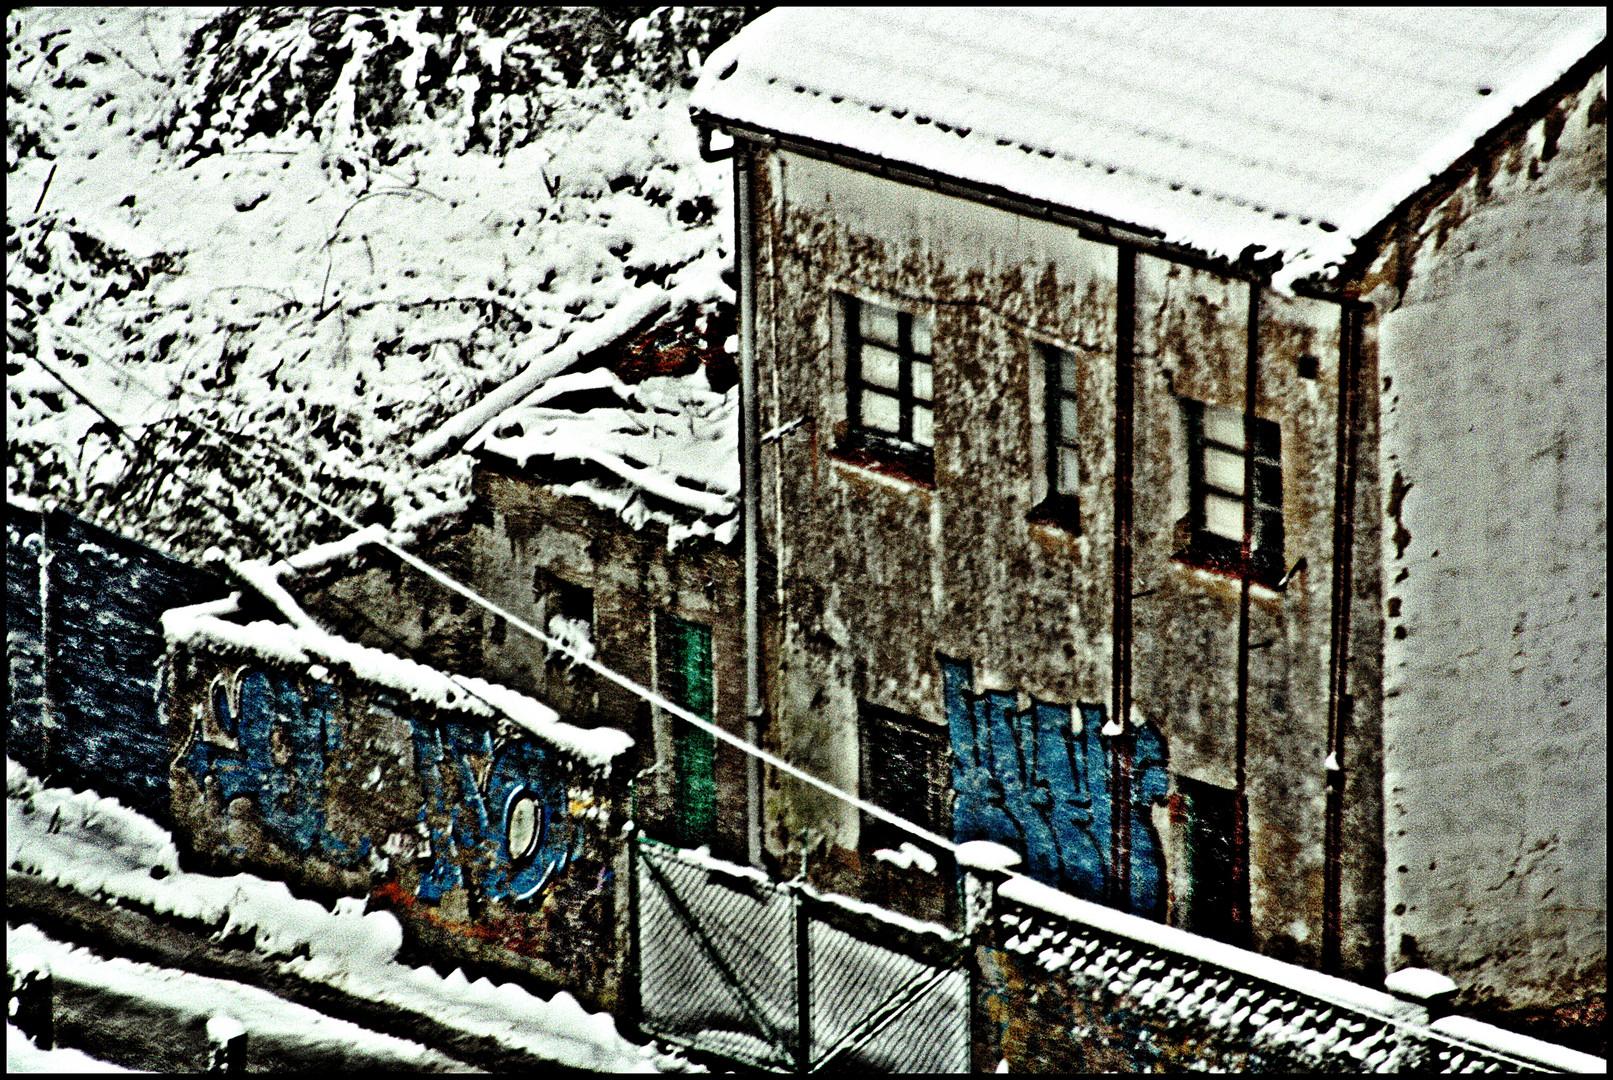 Viejos graffitis